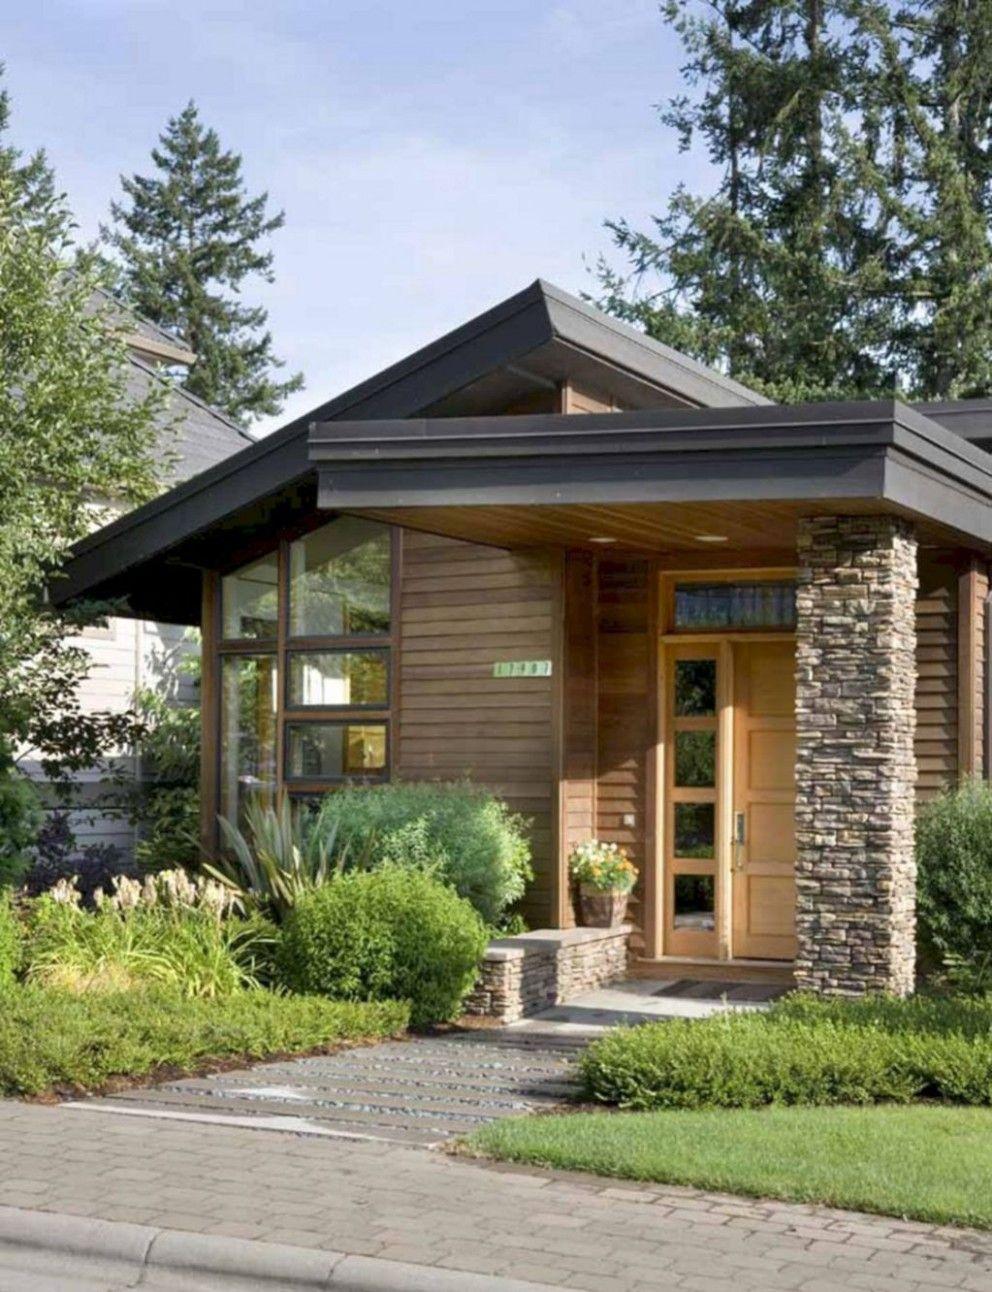 Best Modern Tiny House Designs Desain Rumah Kontemporer Desain Rumah Modern Desain Rumah Kecil